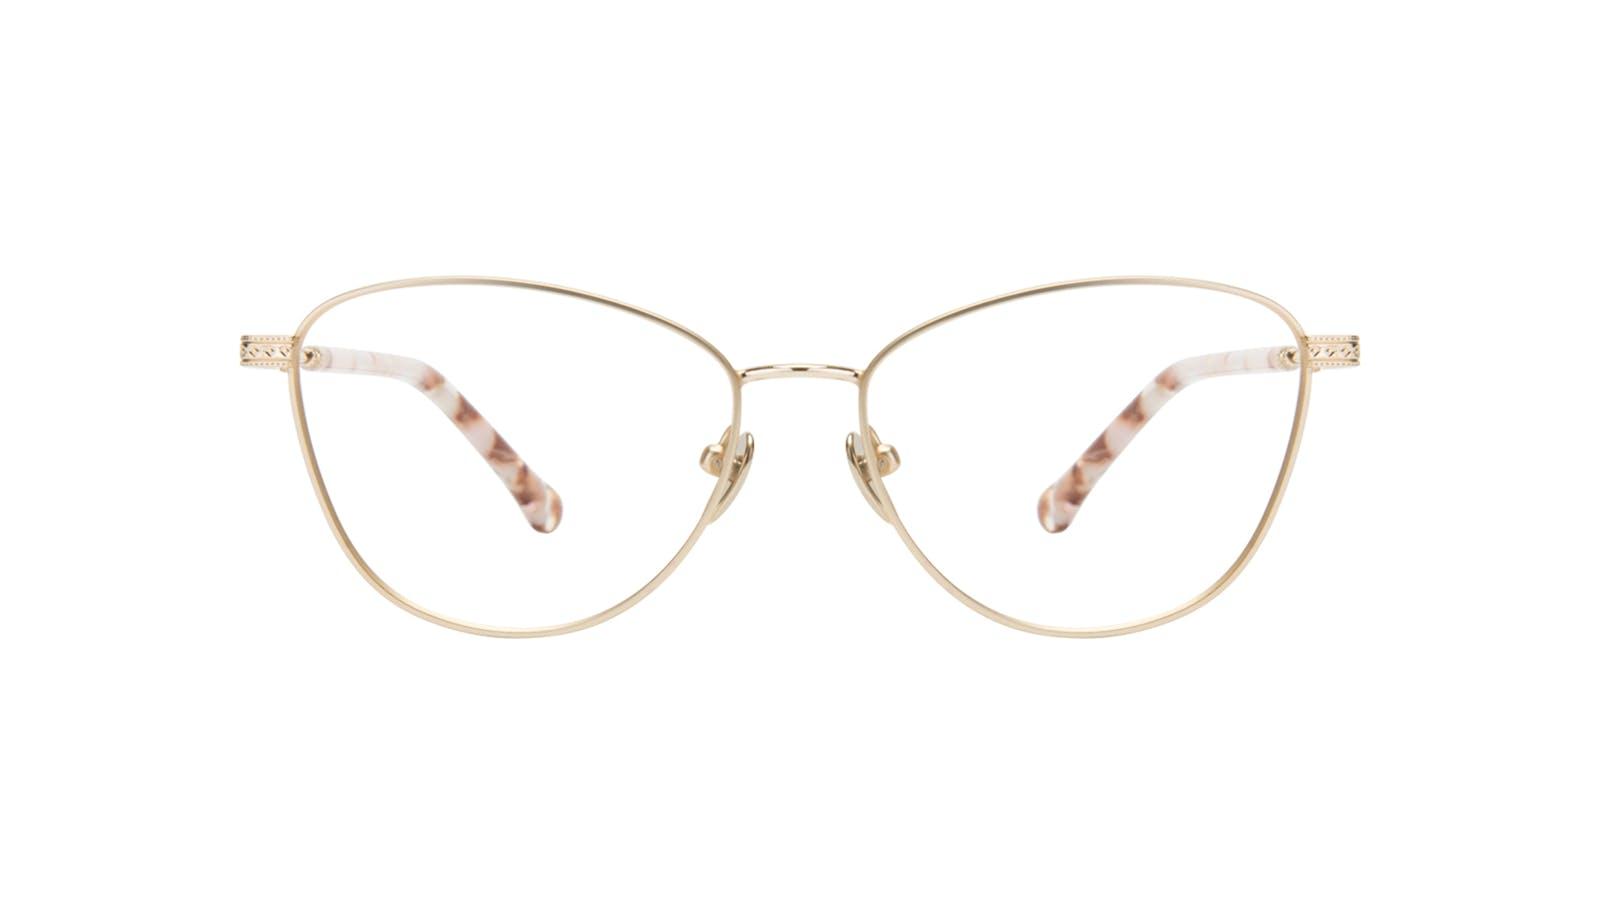 f4e6f9a8f4d4 Affordable Fashion Glasses Cat Eye Eyeglasses Women Bow Golden Quartz